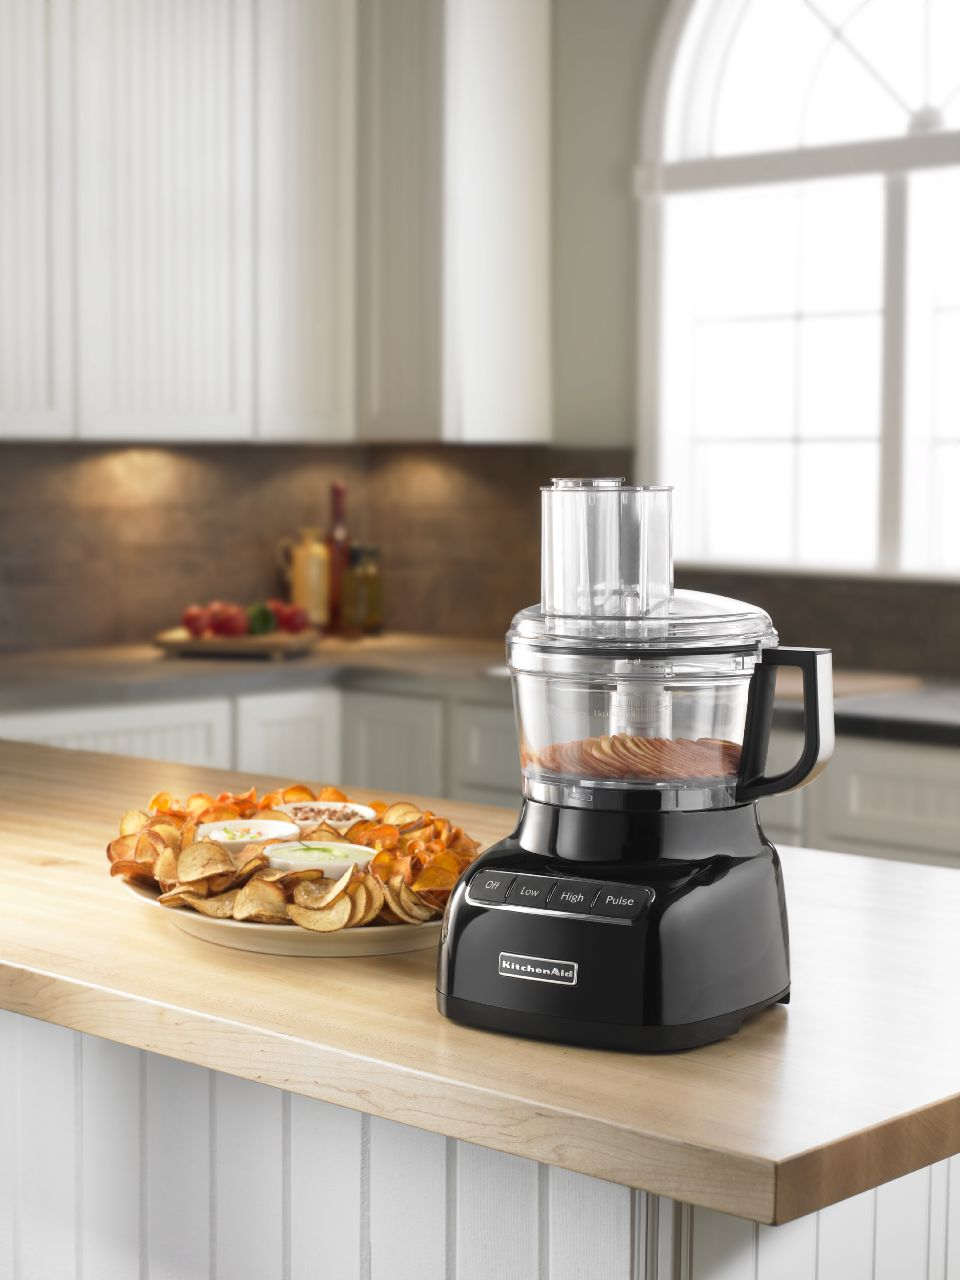 KitchenAid-7-Cup-Food-Processor thumbnail 11